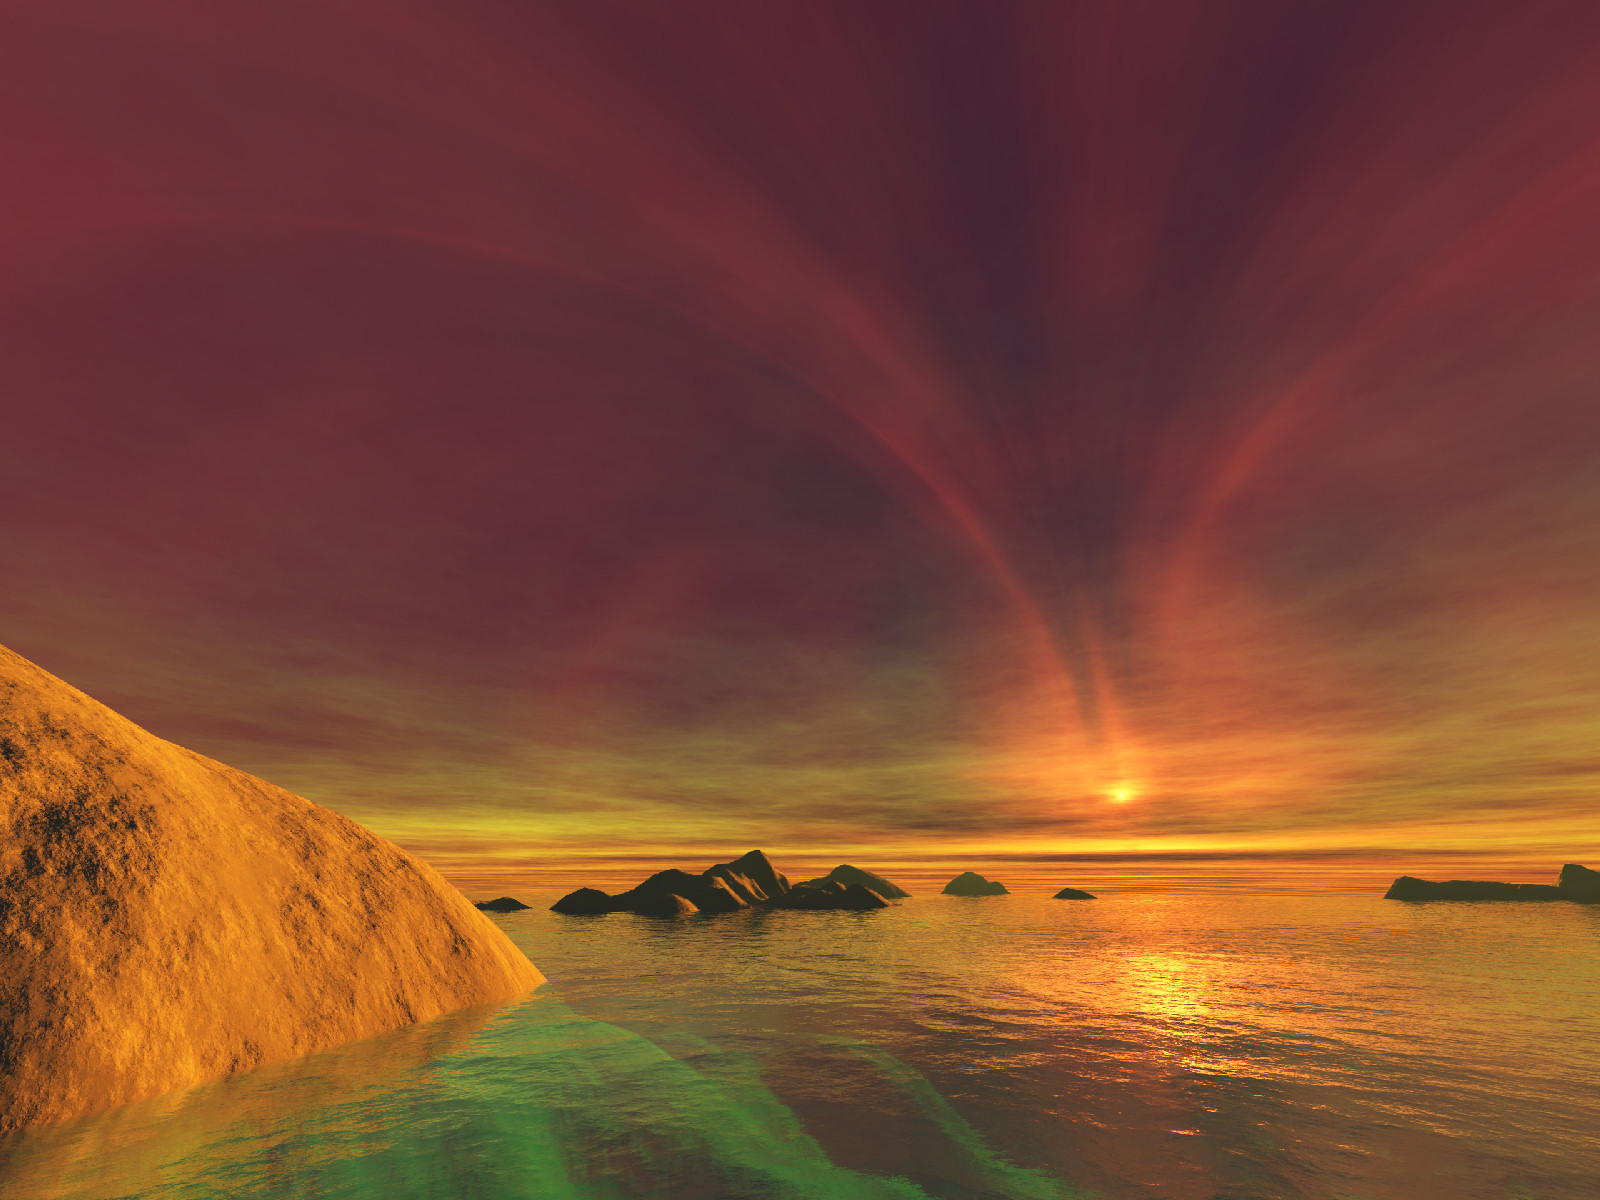 Sunset Desktop Backgrounds and Wallpaper   ChaosTheory   Always 1600x1200